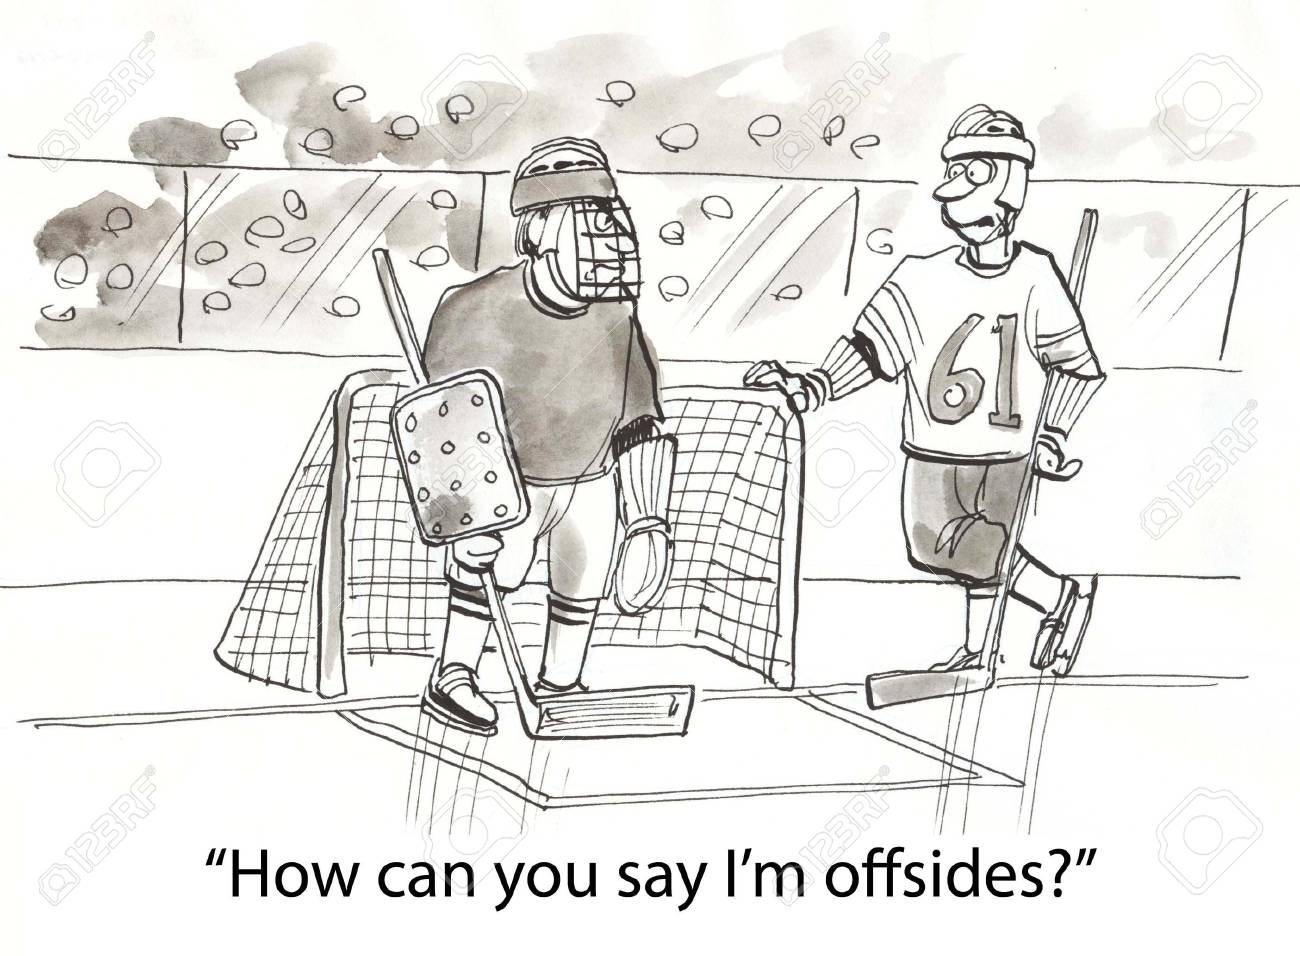 hockey player speaks to goalie Stock Photo - 16860120